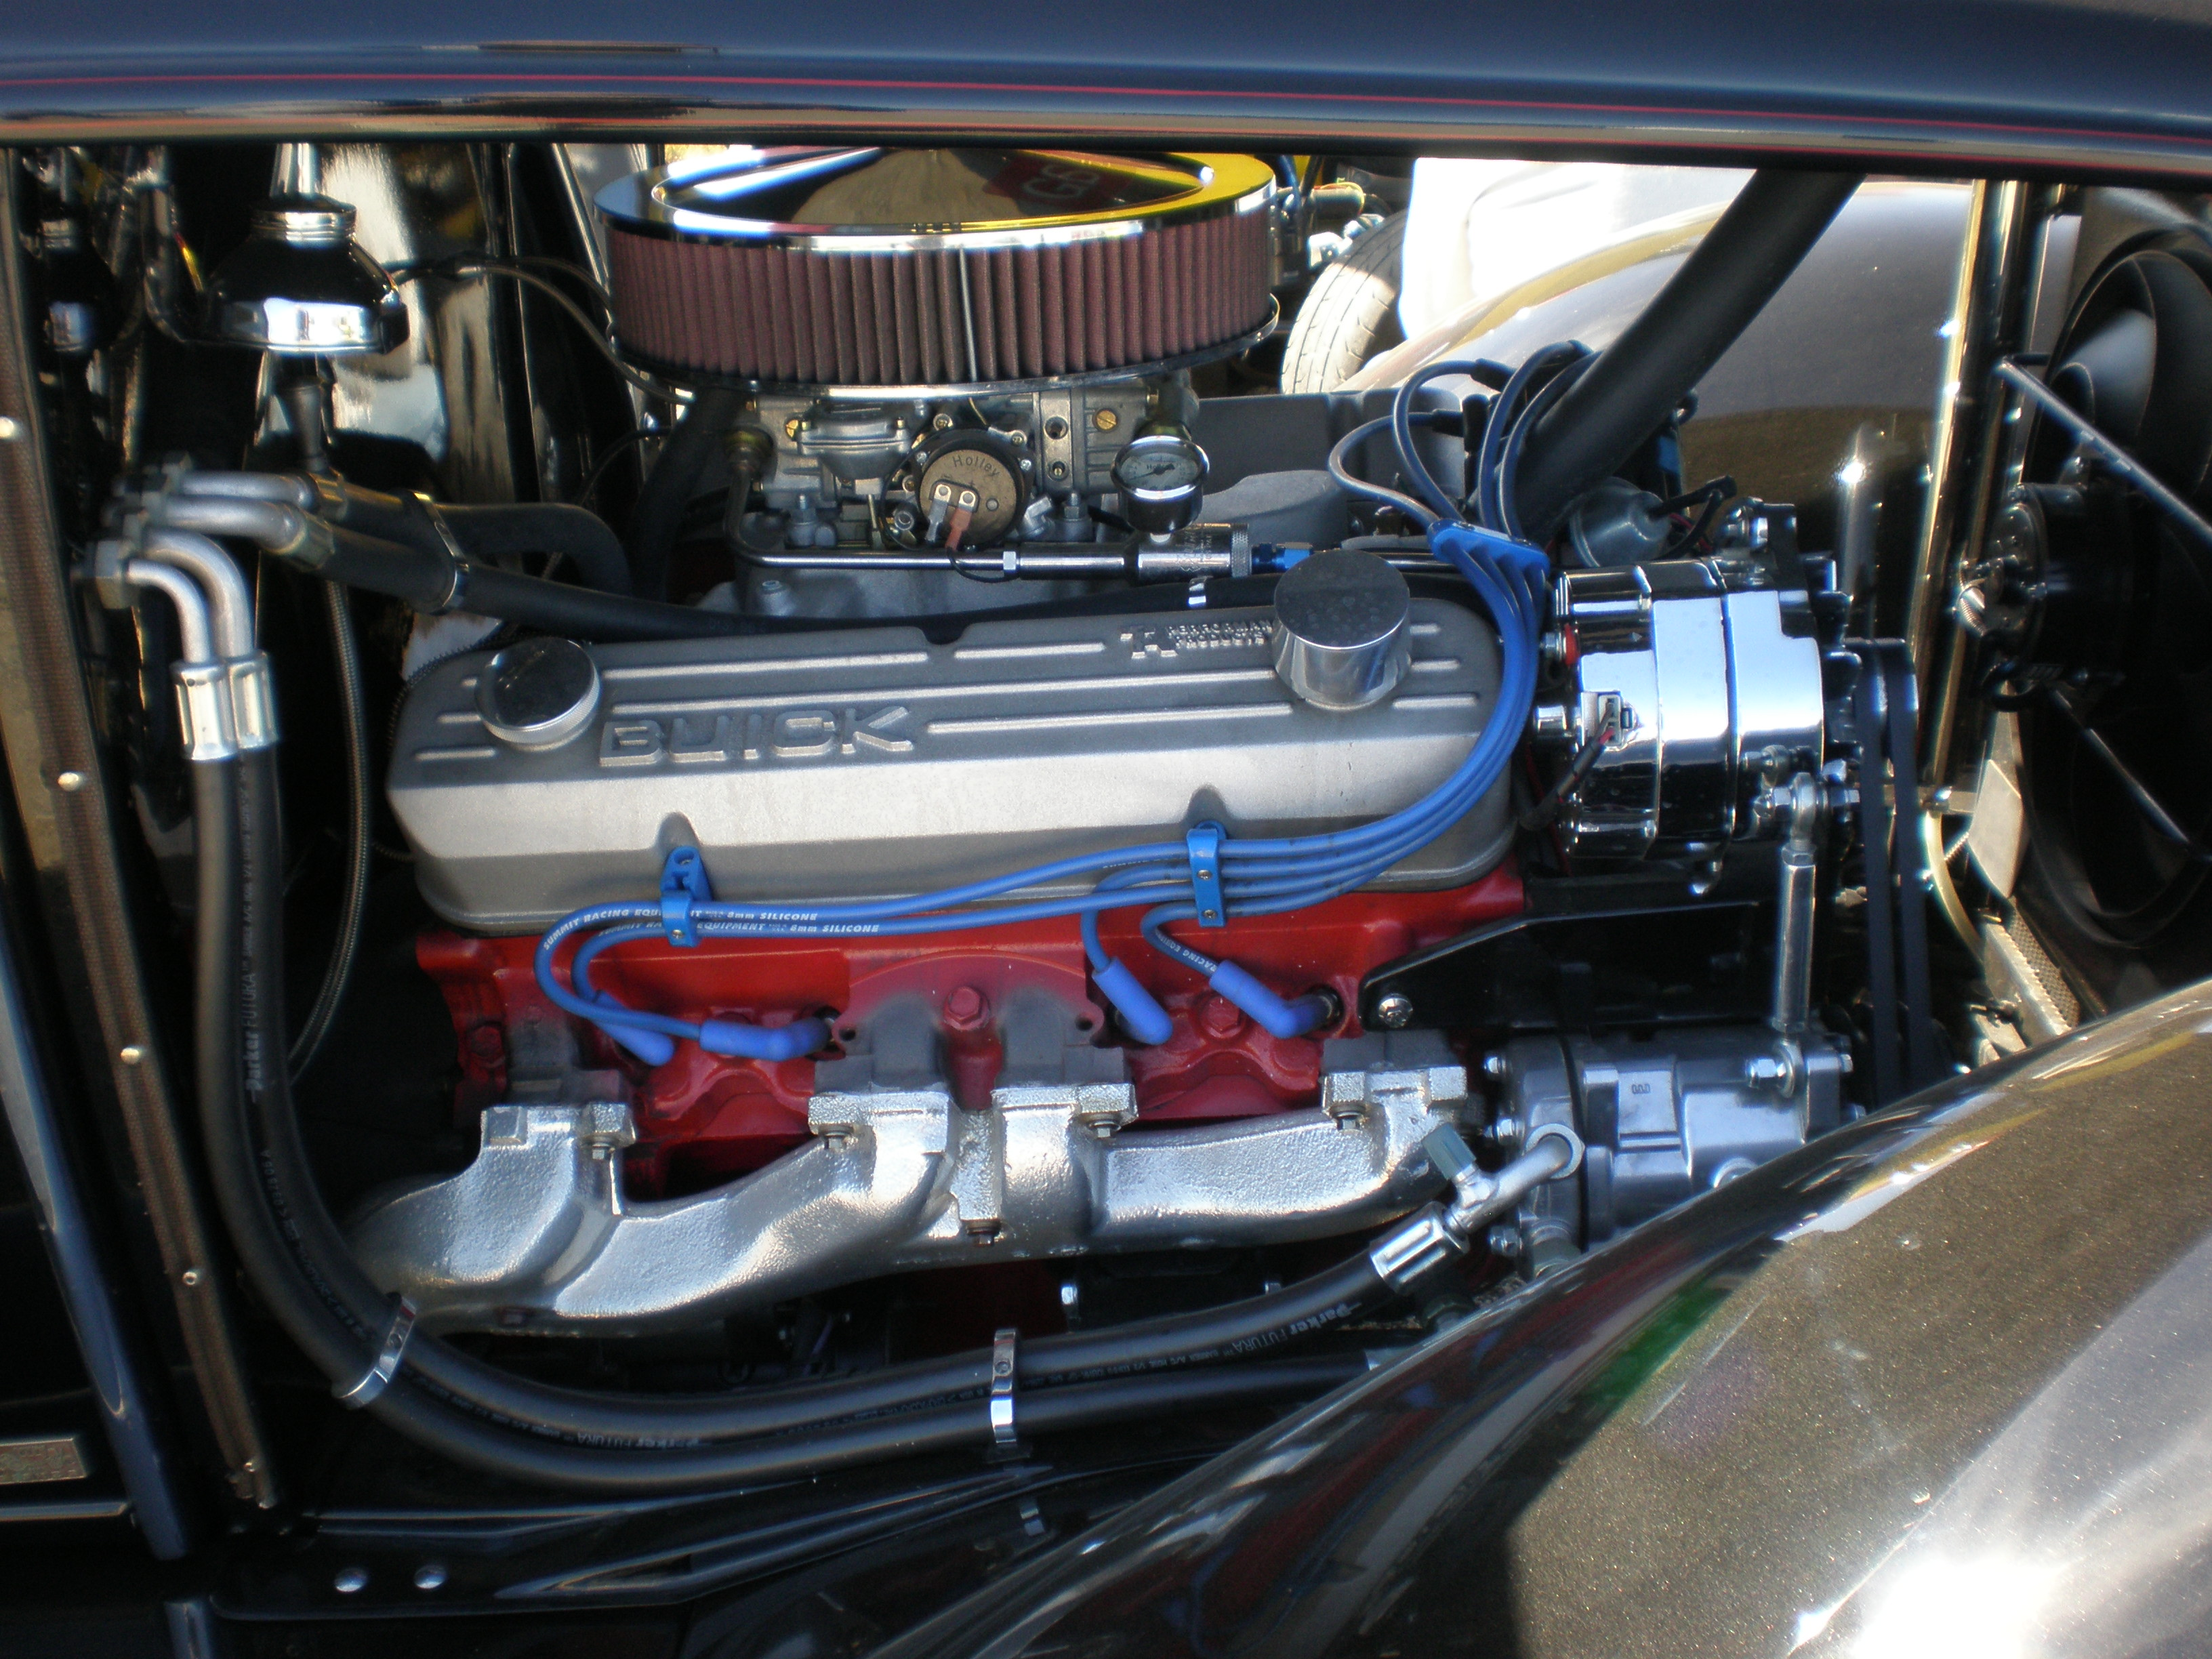 File:1931 black Buick Victoria engine.JPG - Wikimedia Commons